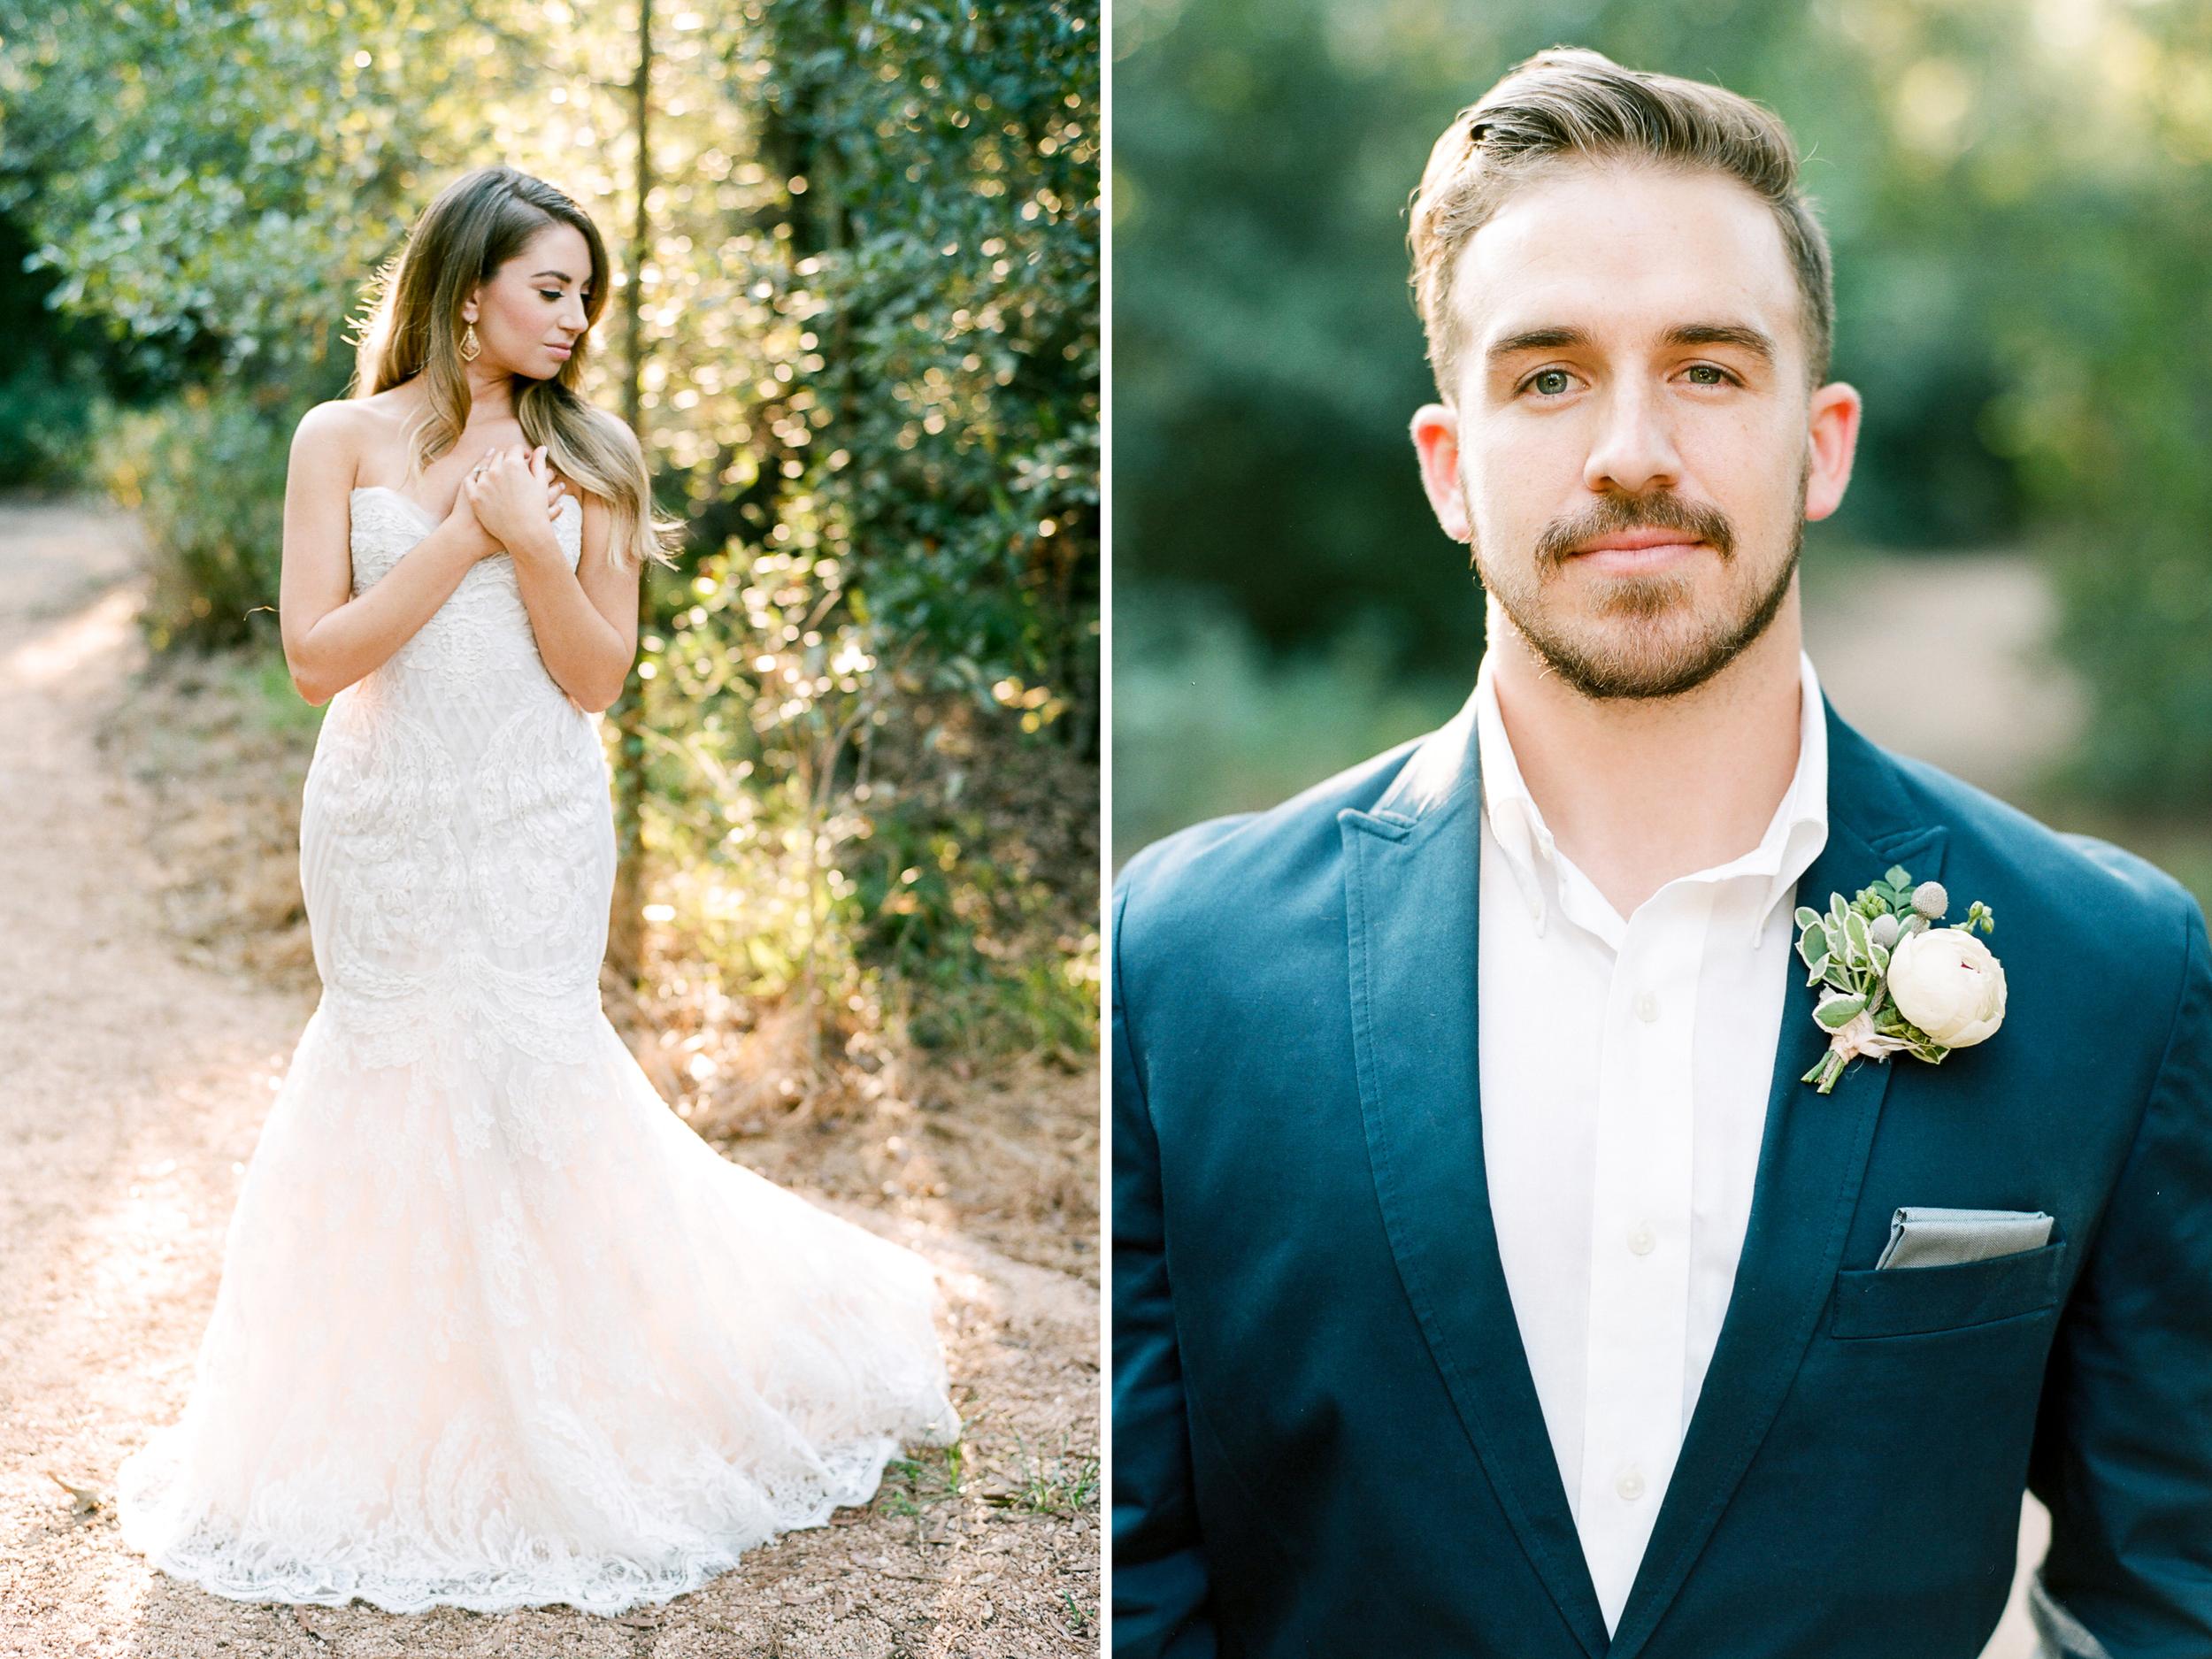 dana-fernandez-photography-the-wedding-chicks-film-houston-wedding-photography-destination-101.jpg